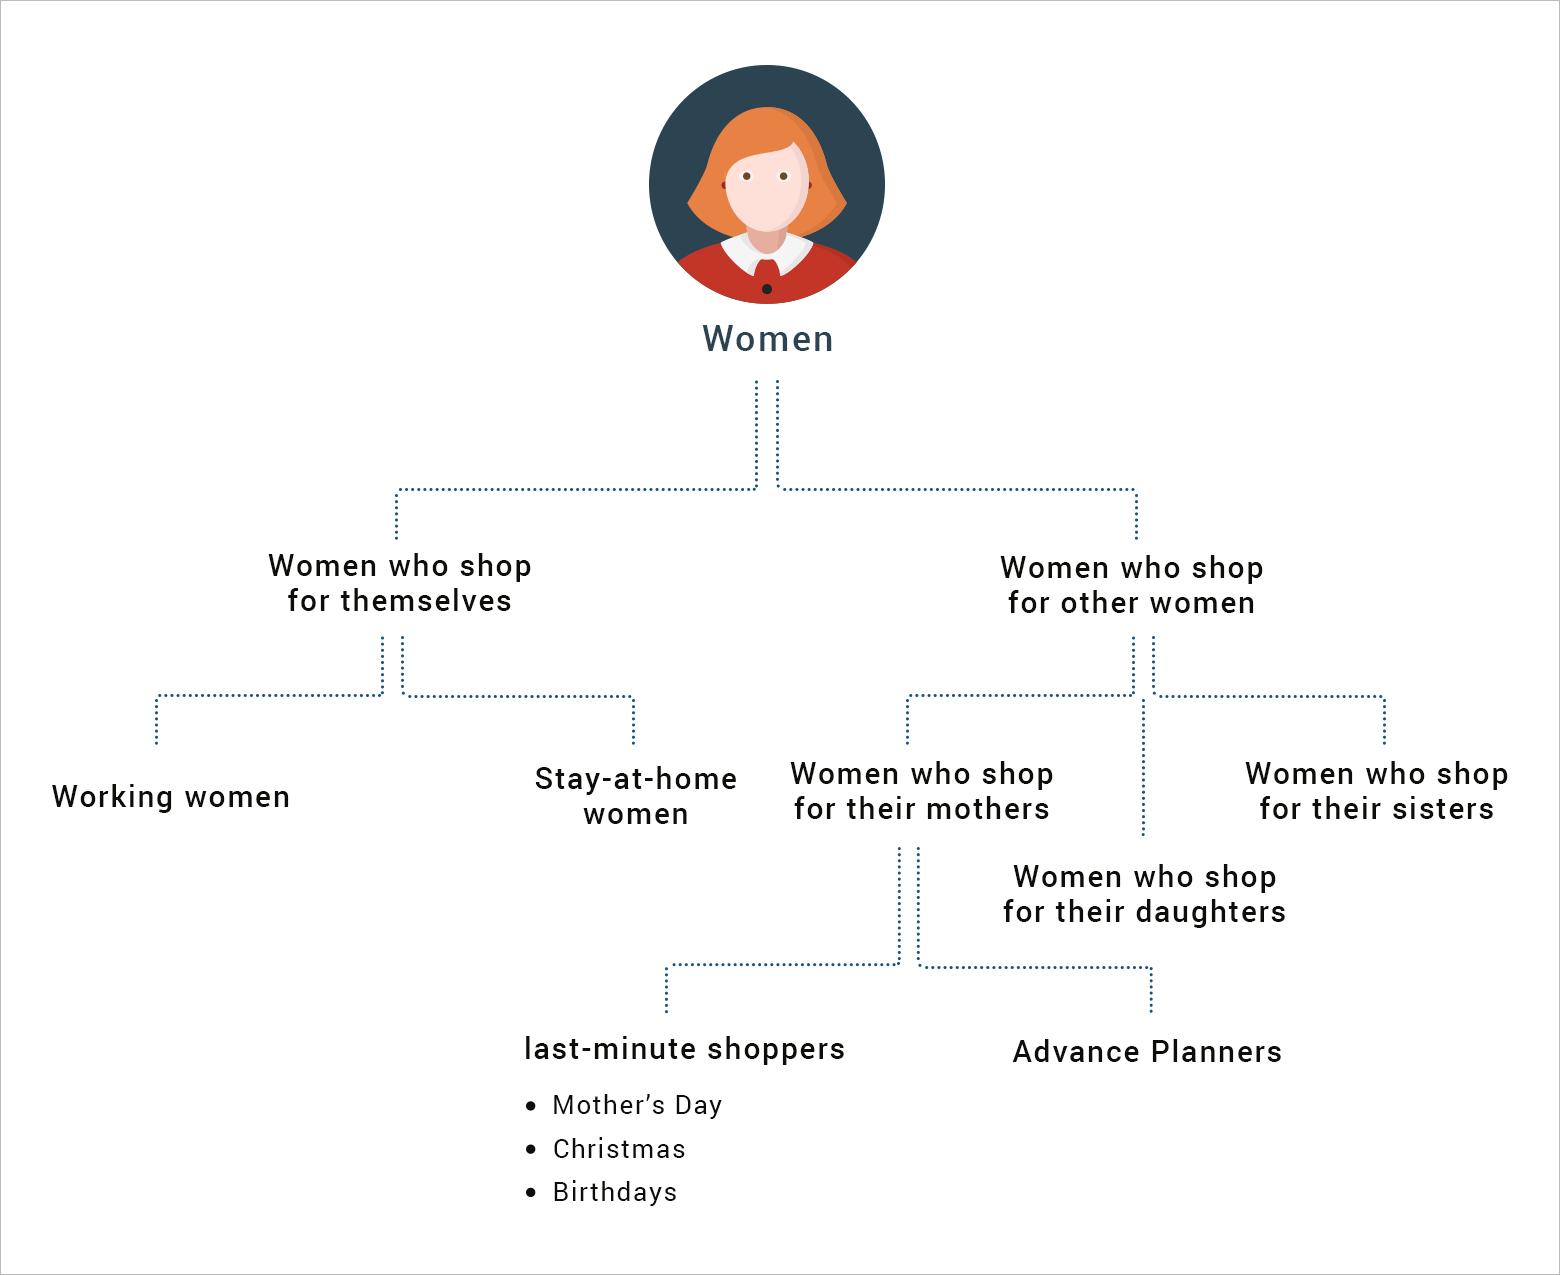 Micro segmentation of women shoppers